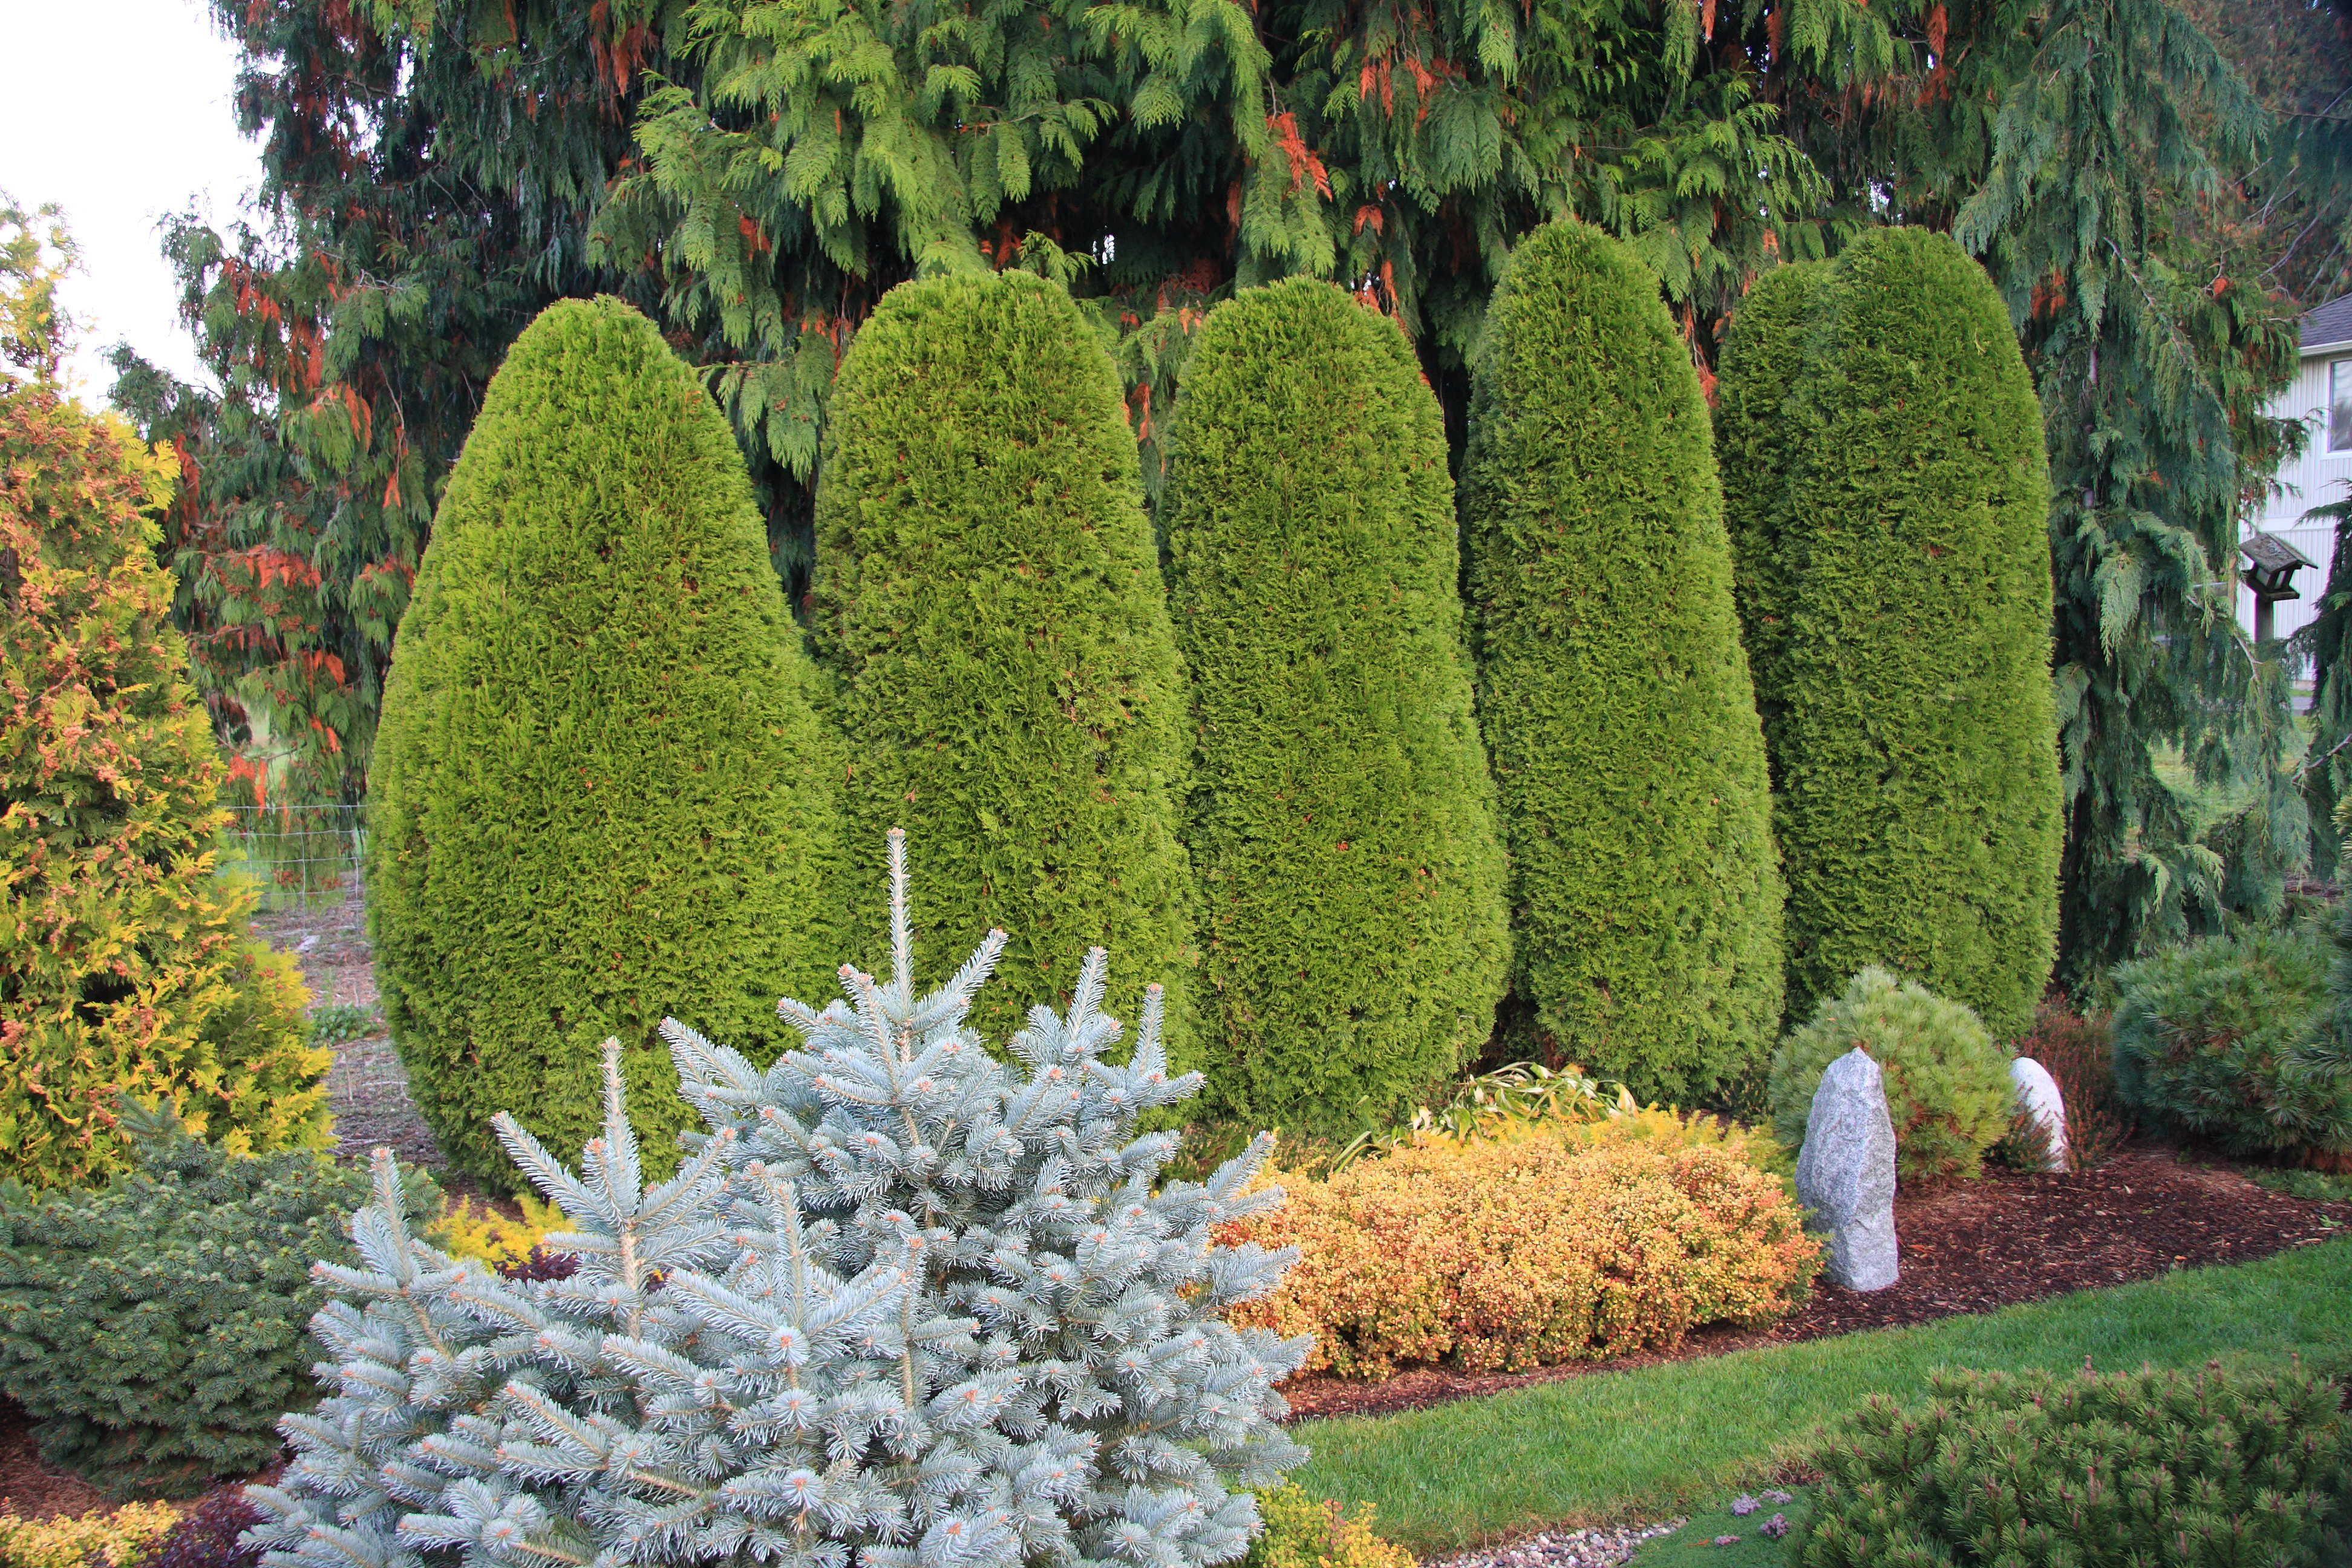 818209576625e73b63b4946868cecefc - Edgar's Gardening And Tree Service